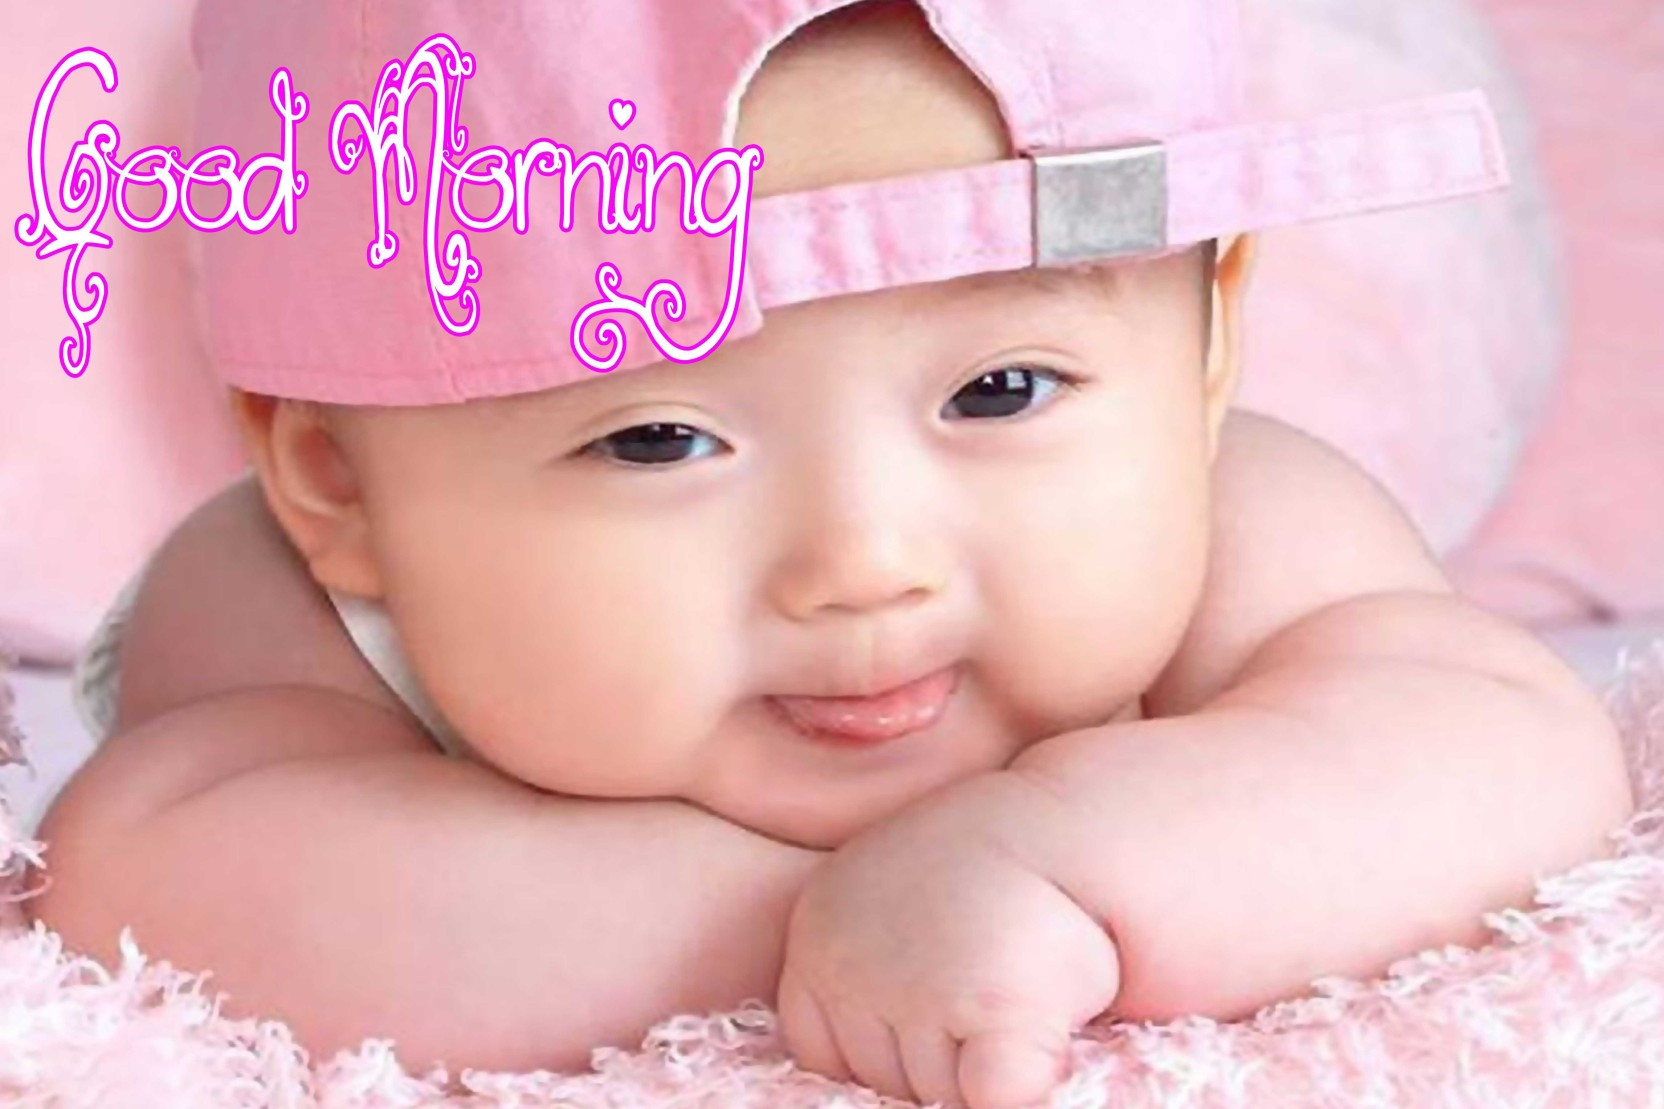 Pinki Baby Poster With Good Morning Design Upfk504721 Paper Print